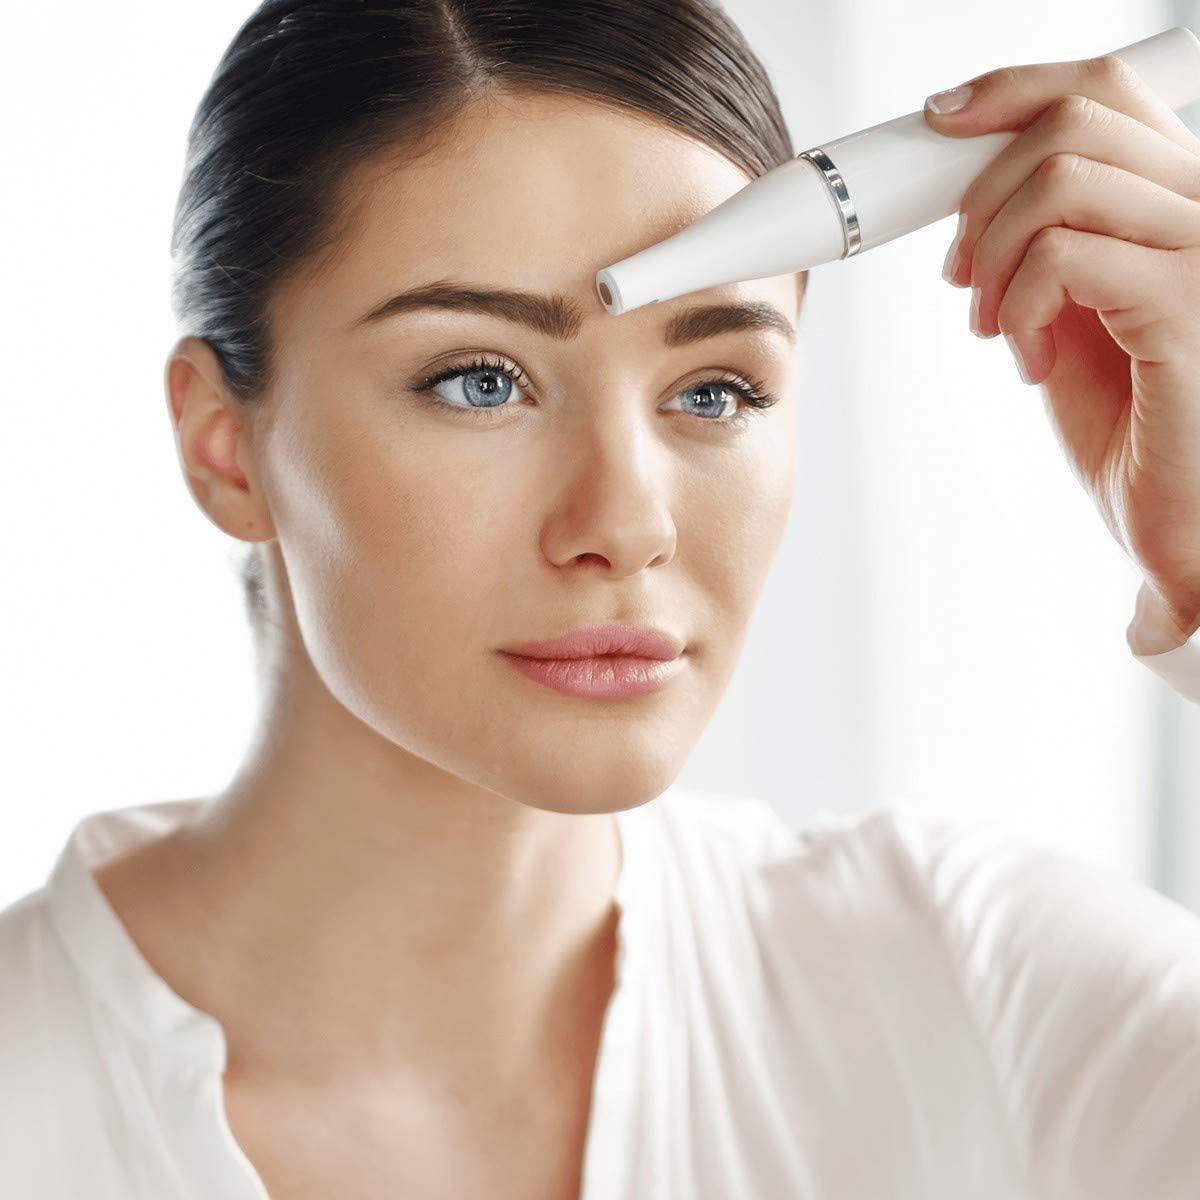 Braun Face 831 Womens Ladies Facial Hair Epilator 3